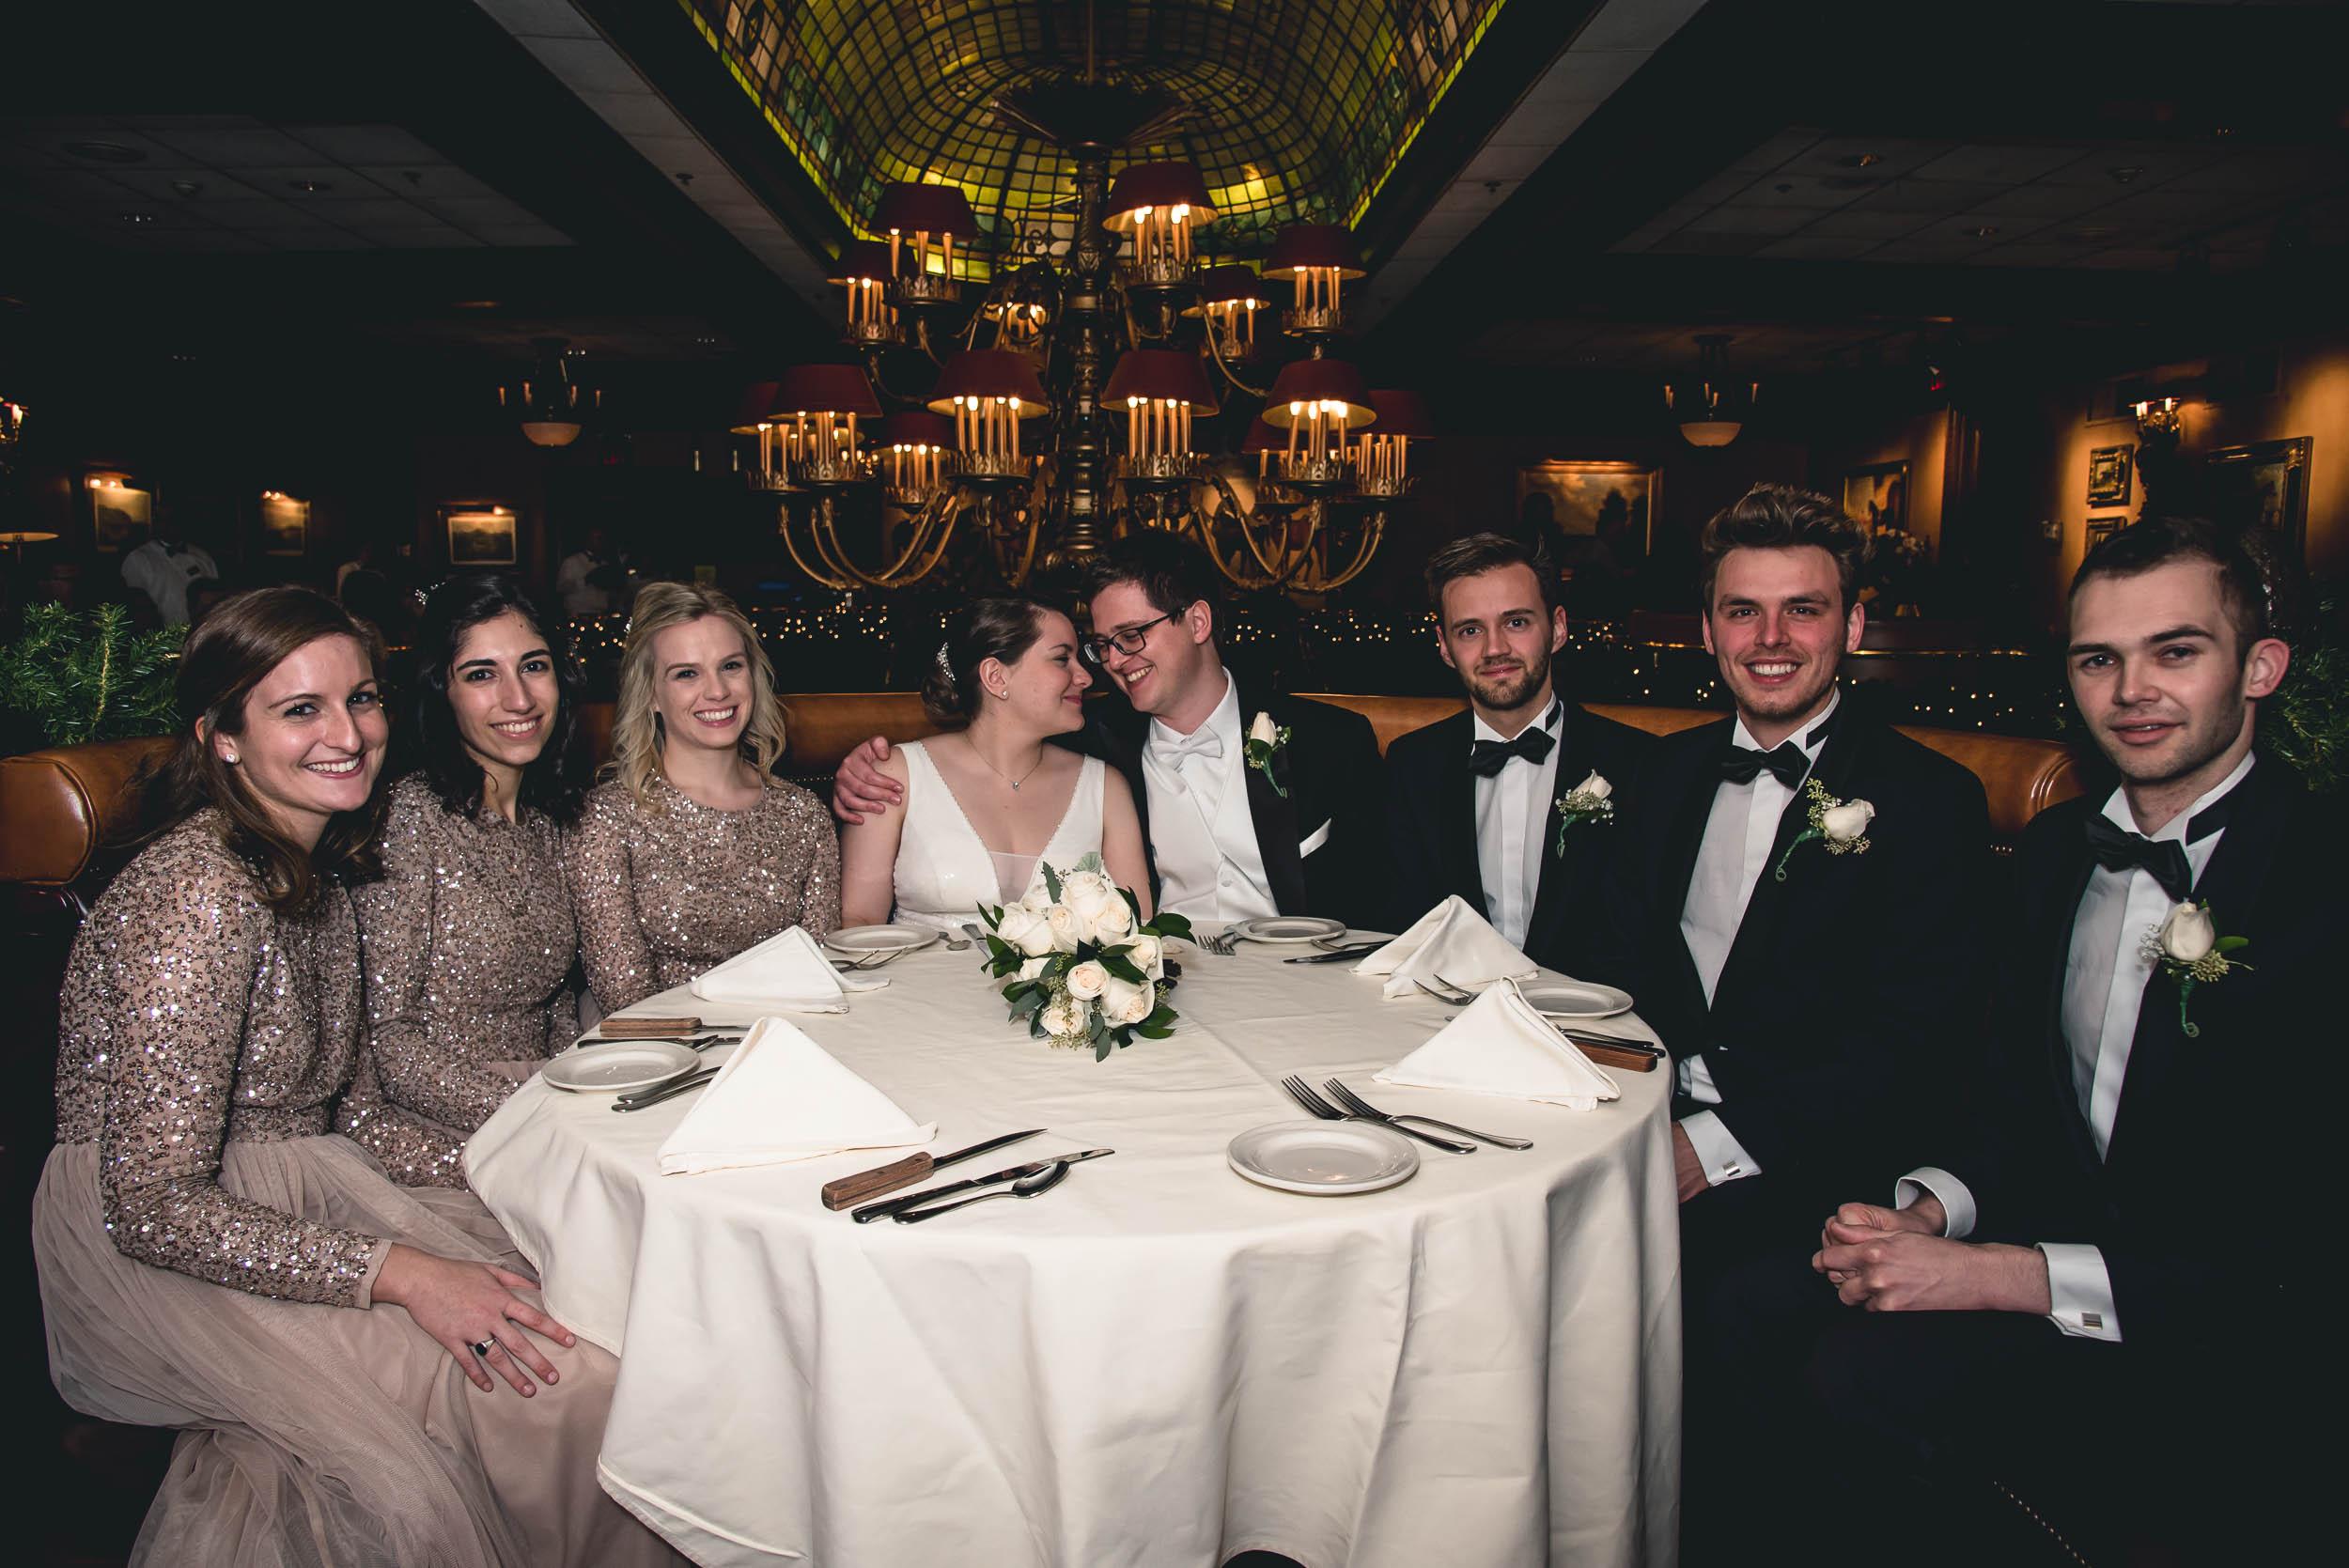 KatieandMathias_Morristown_NewJersey_Wedding_Church_Assumption_Madison_Hotel(50of65).jpg